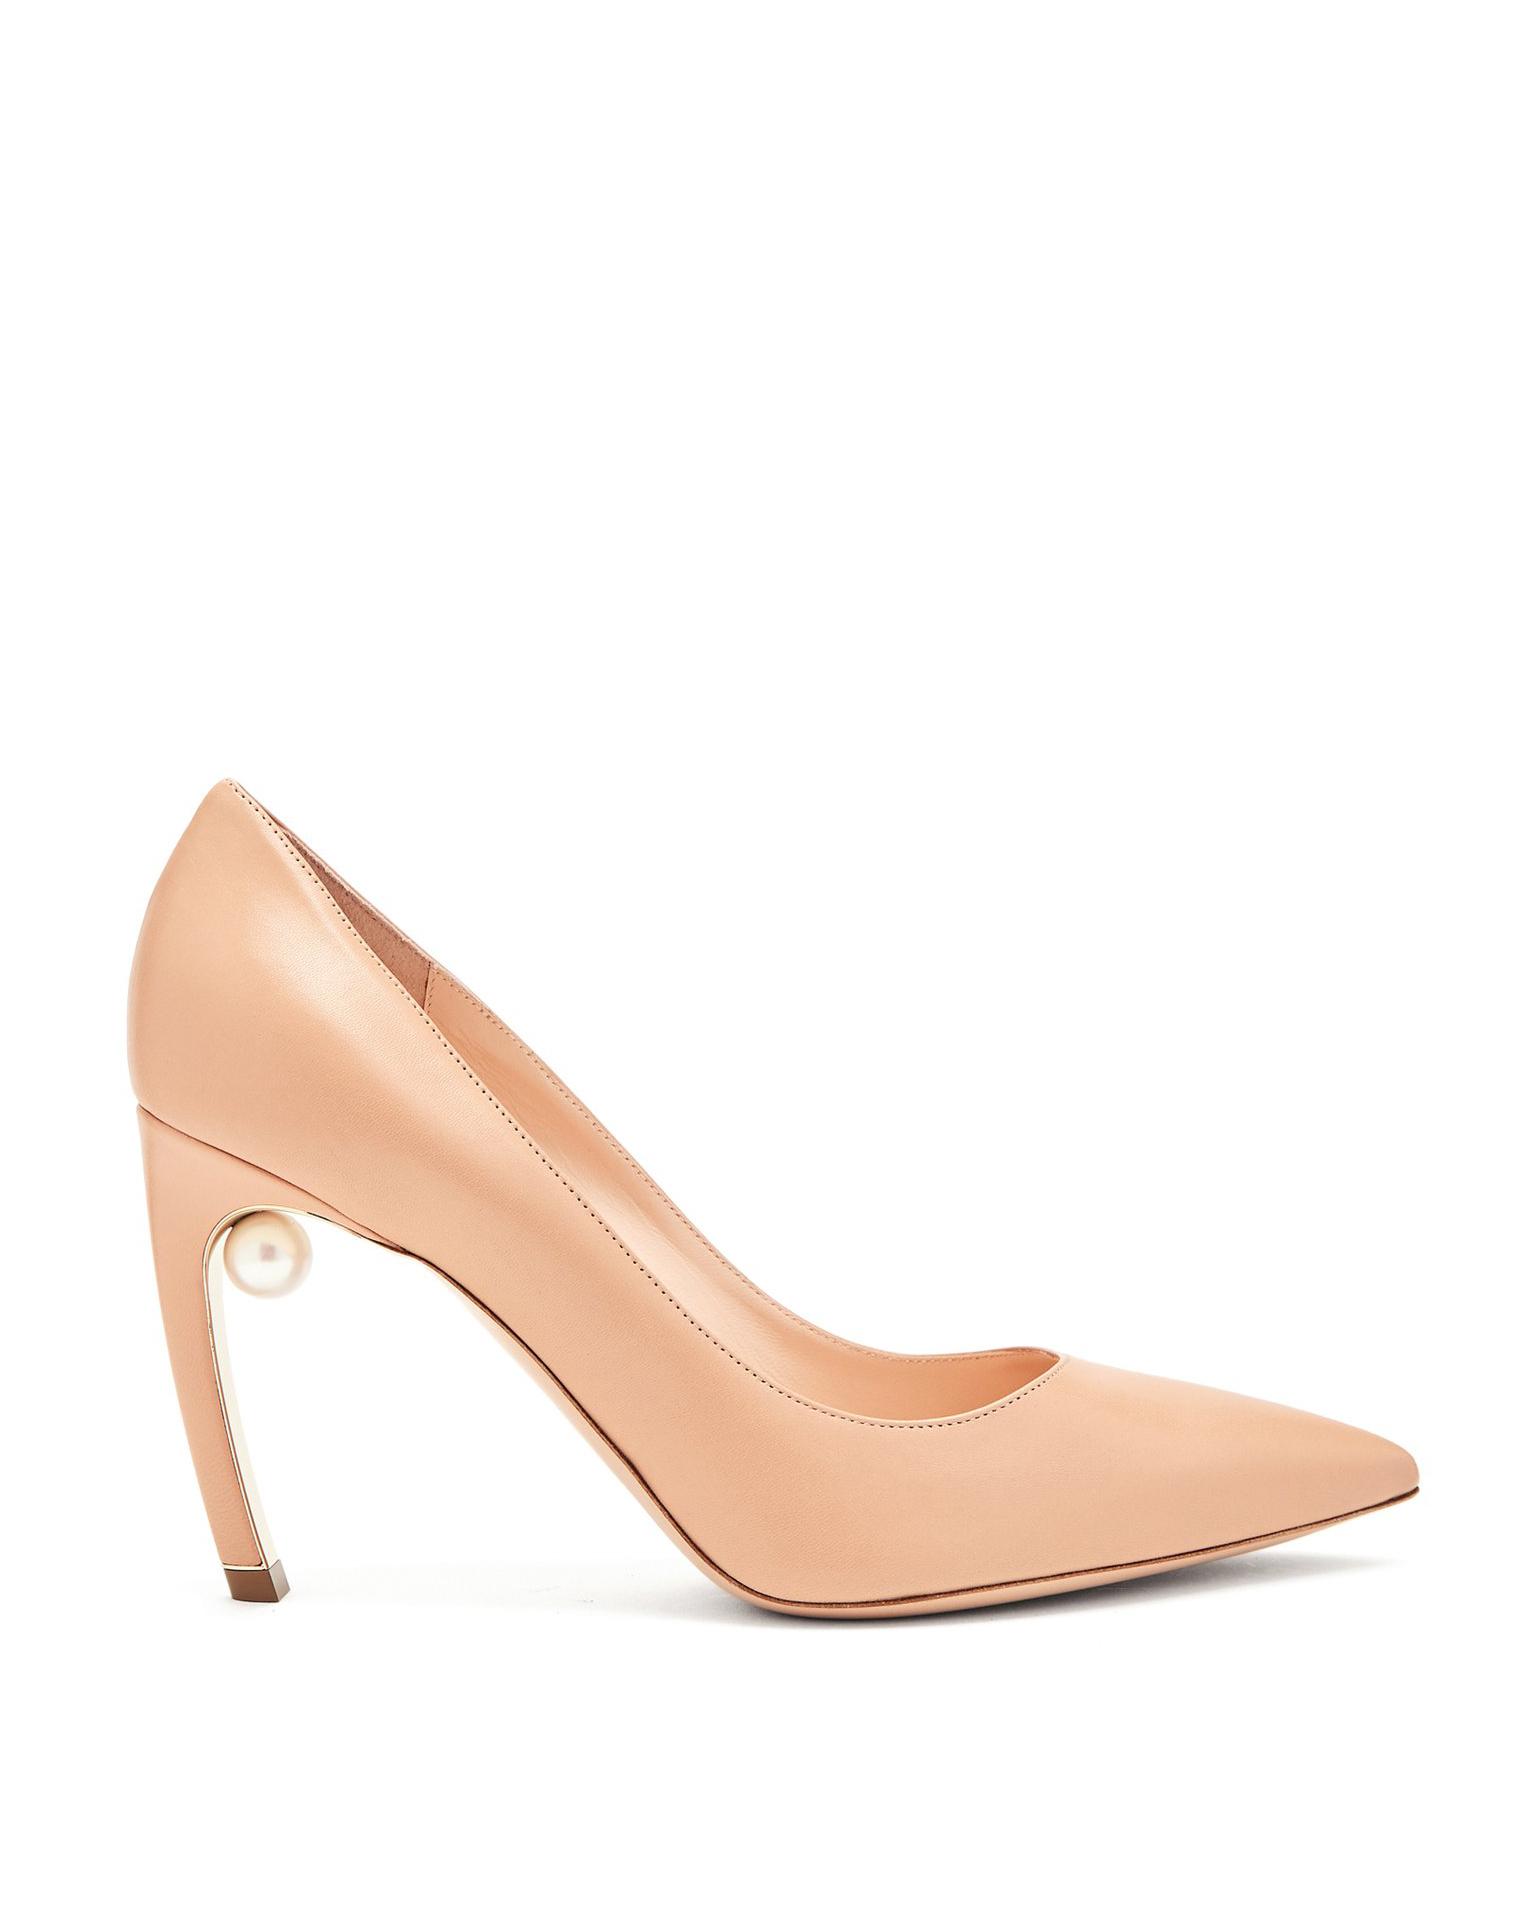 nude shoe high heel single pearl tan pumps